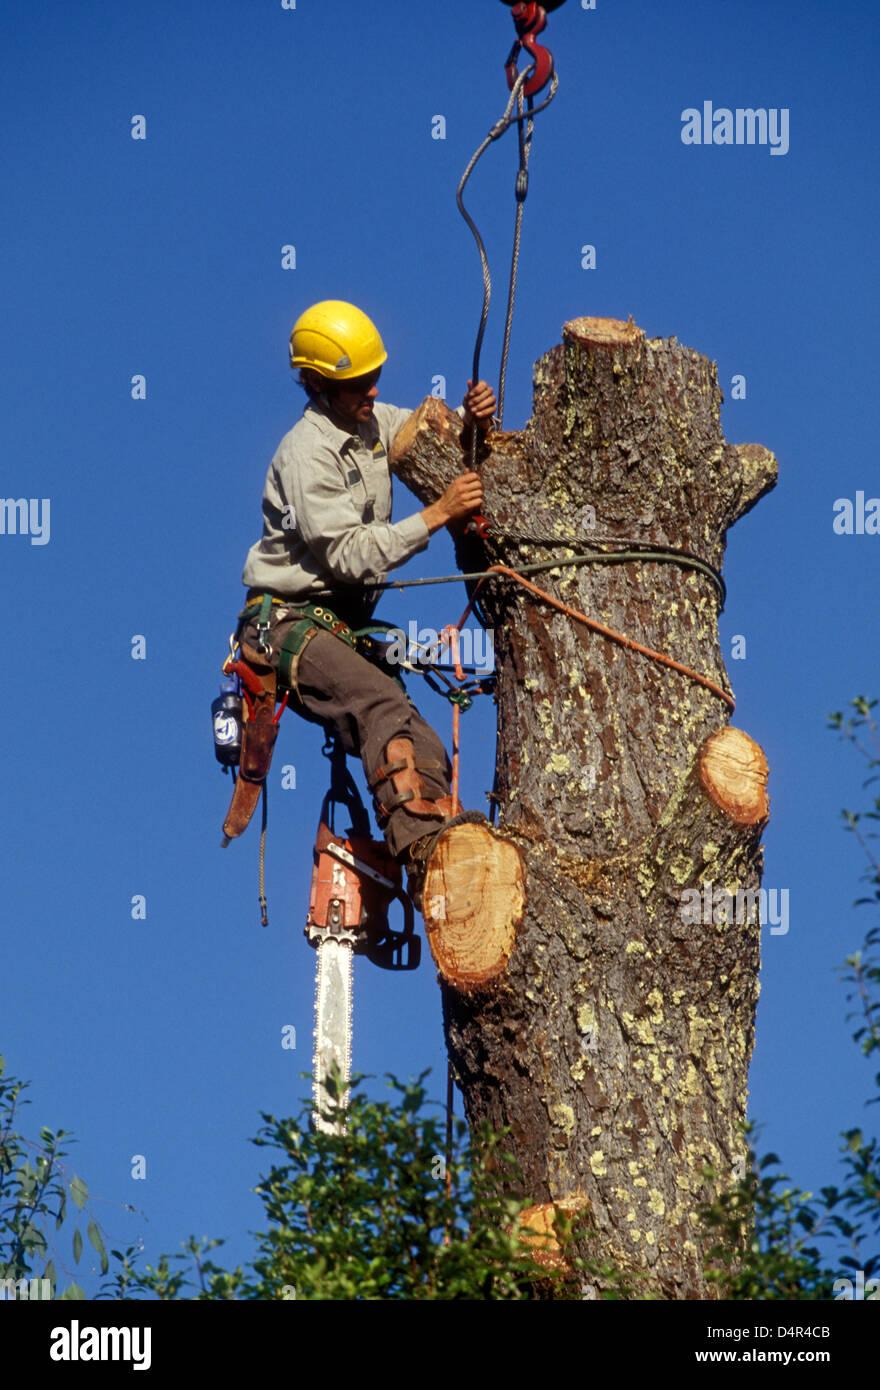 tree felling, tree feller, tree cutter, tree removal, adult man, lumberman, lumberjack, Novato, Marin County, California - Stock Image